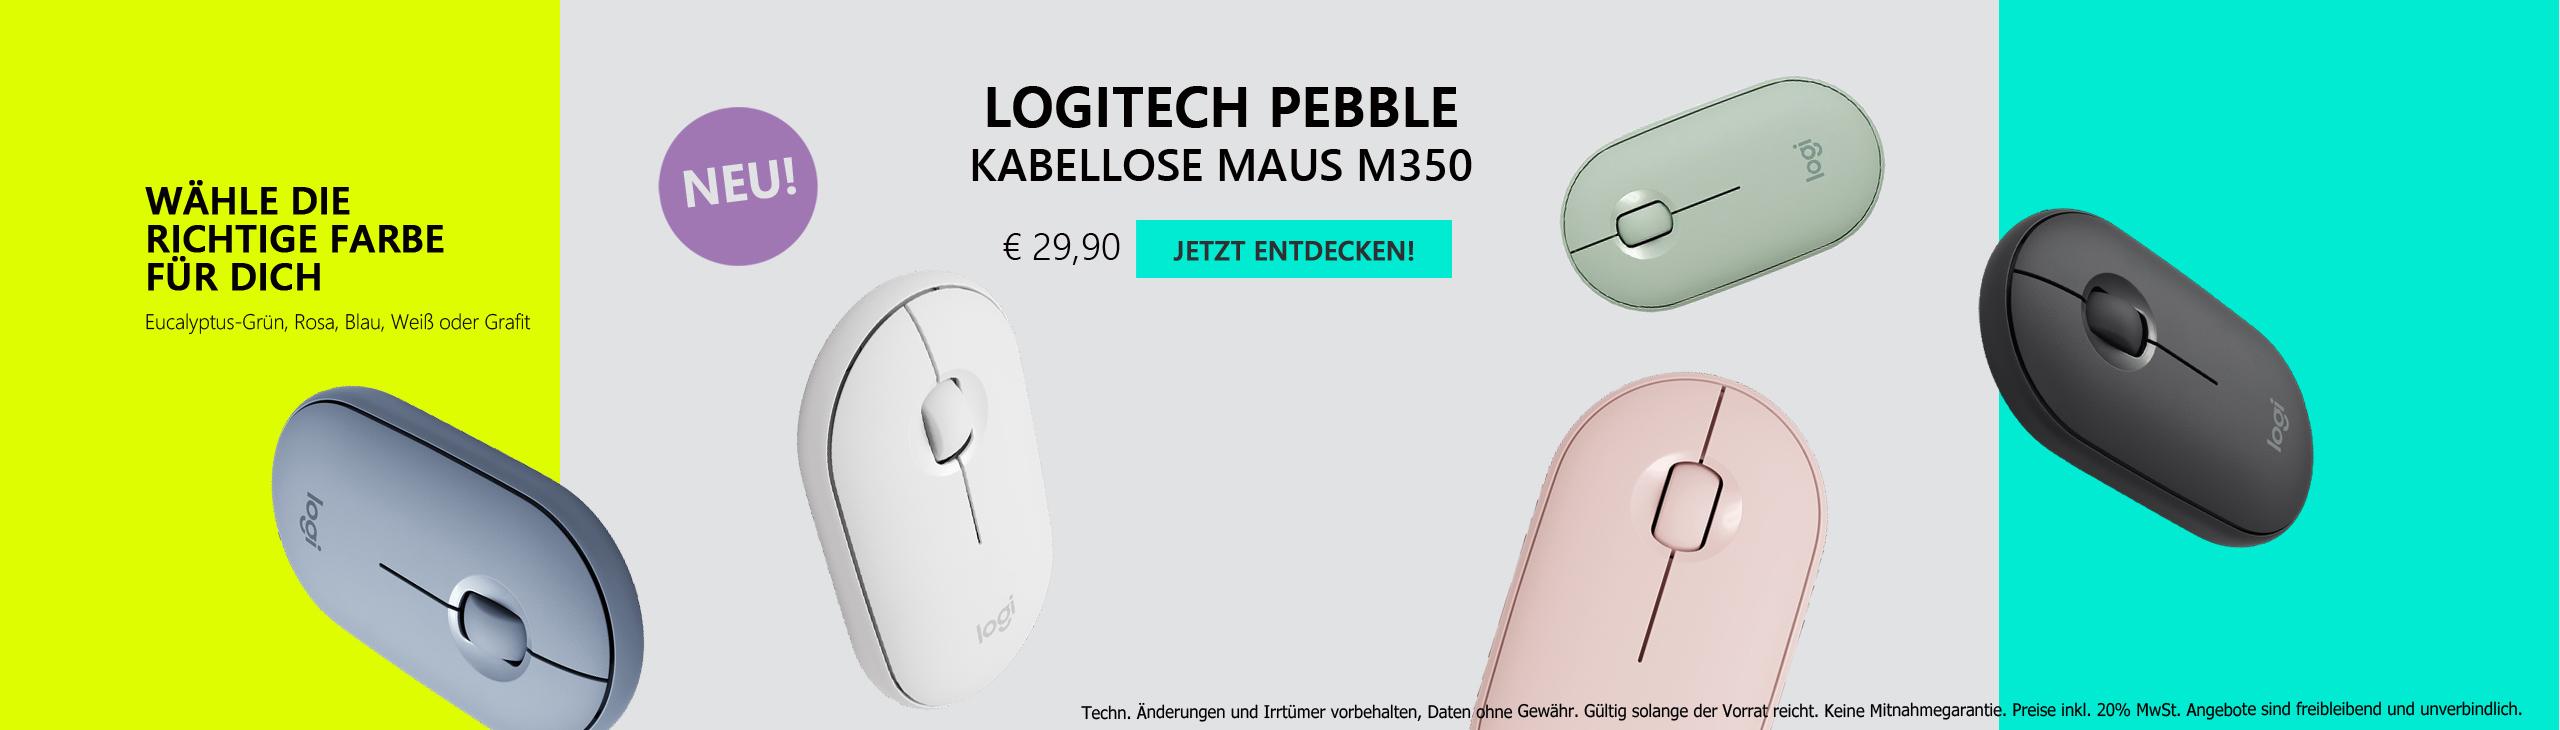 Banner Logitech Pebble